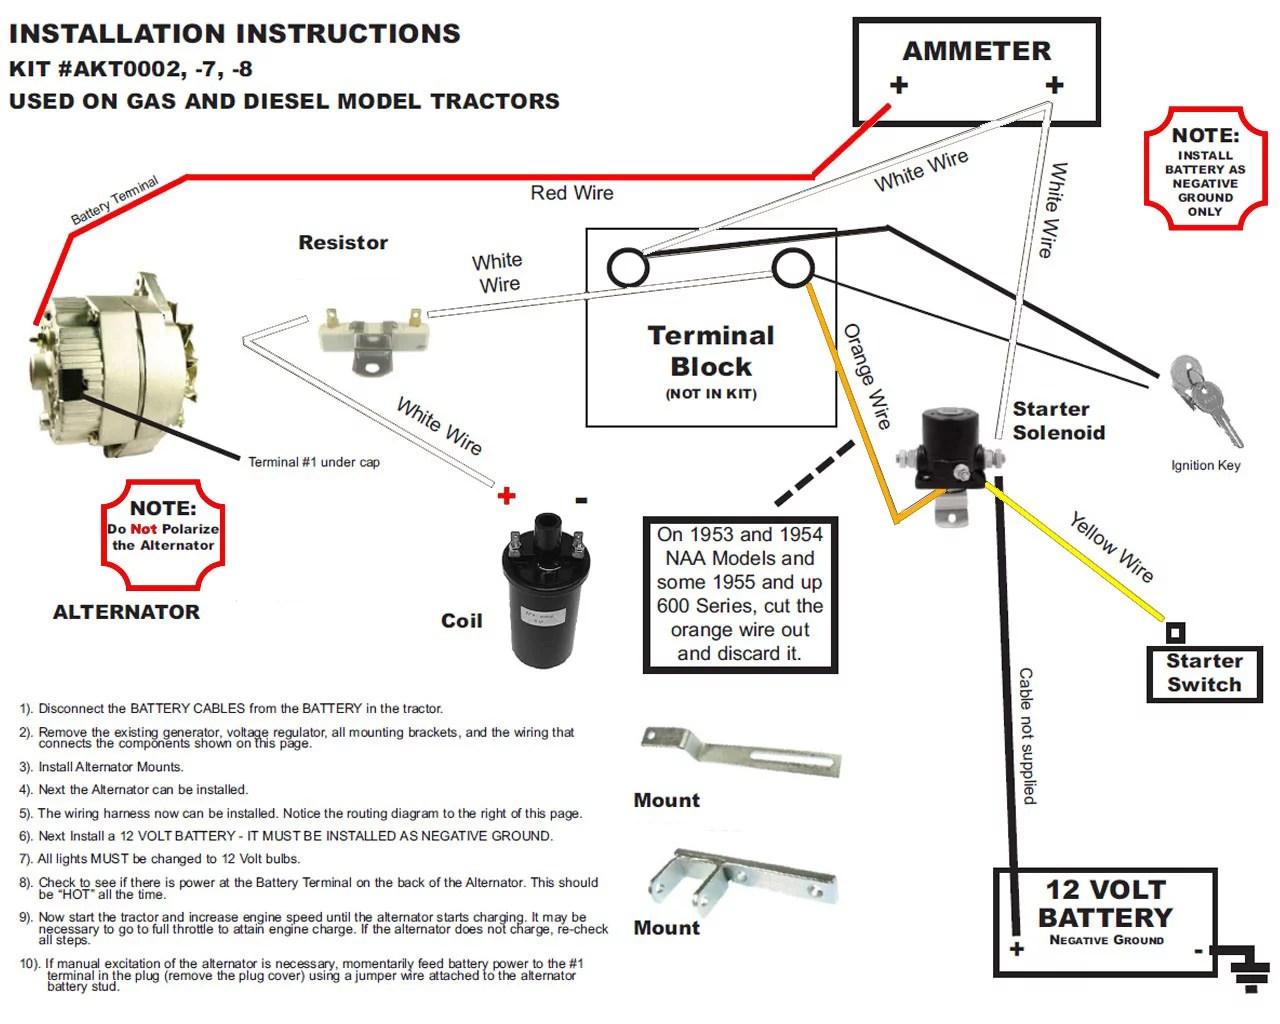 new alternator conversion kit fits ford naa tractor generator 851new alternator conversion kit fits ford naa [ 1280 x 1024 Pixel ]